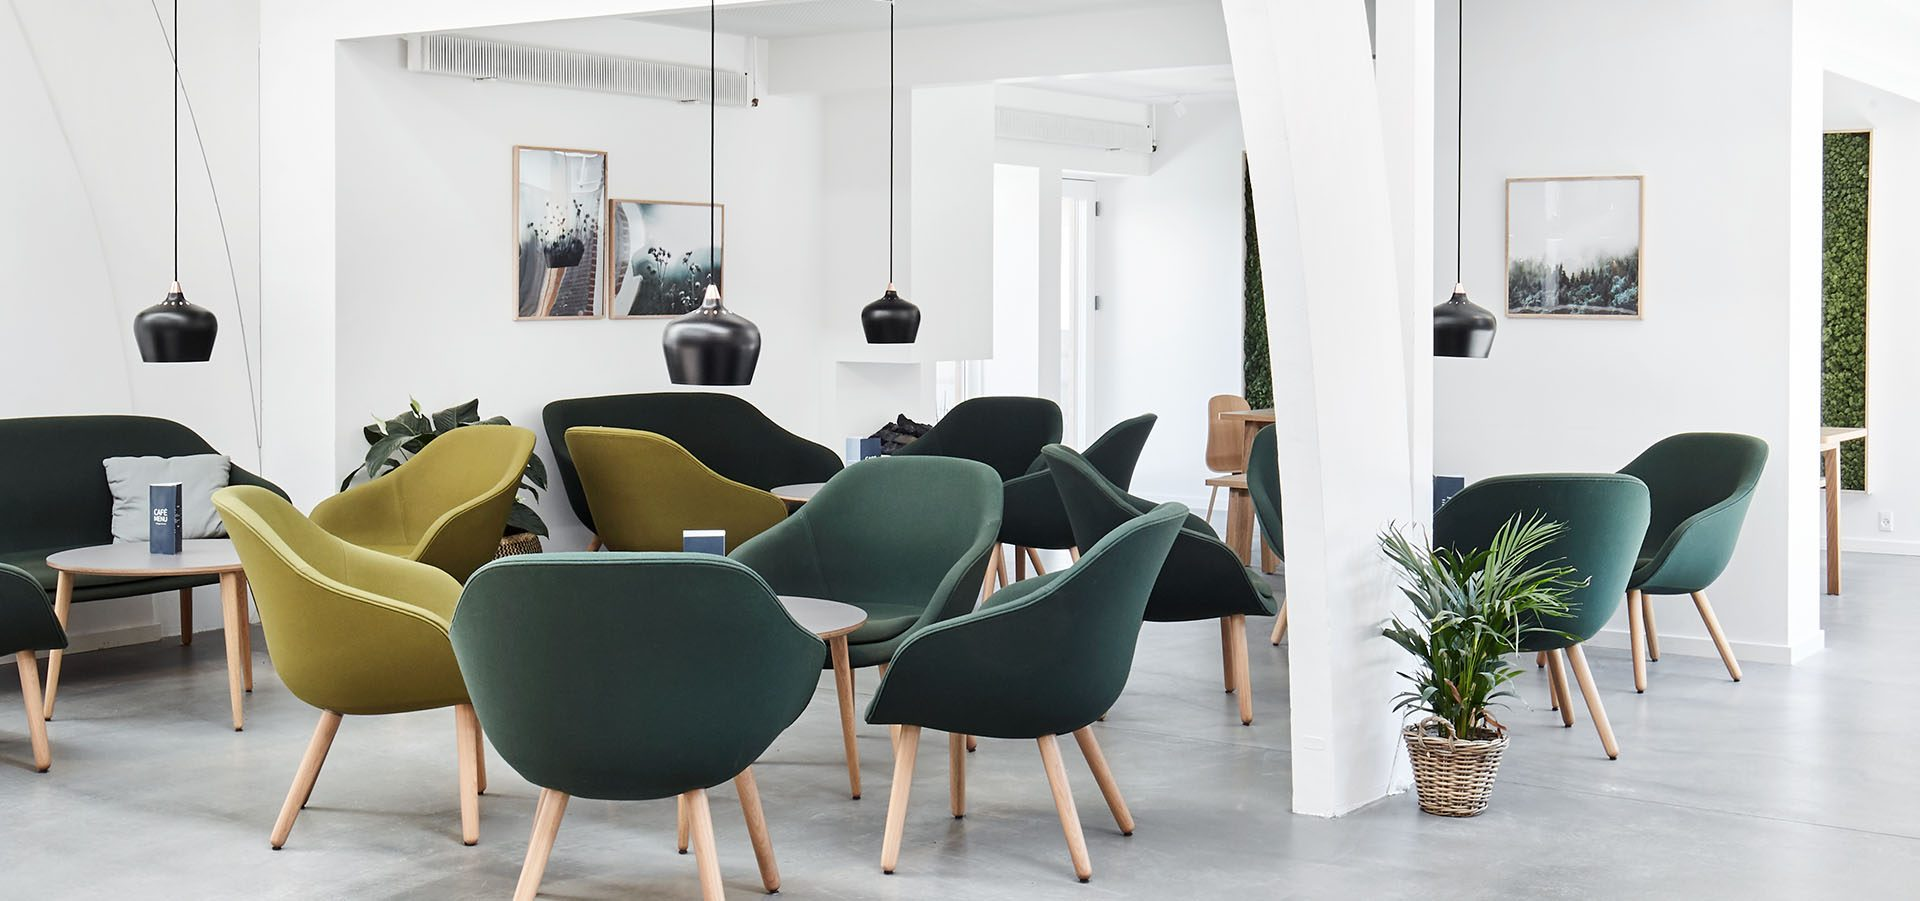 ZESO TRANSFORMATION / Danhostel Copenhagen Amager